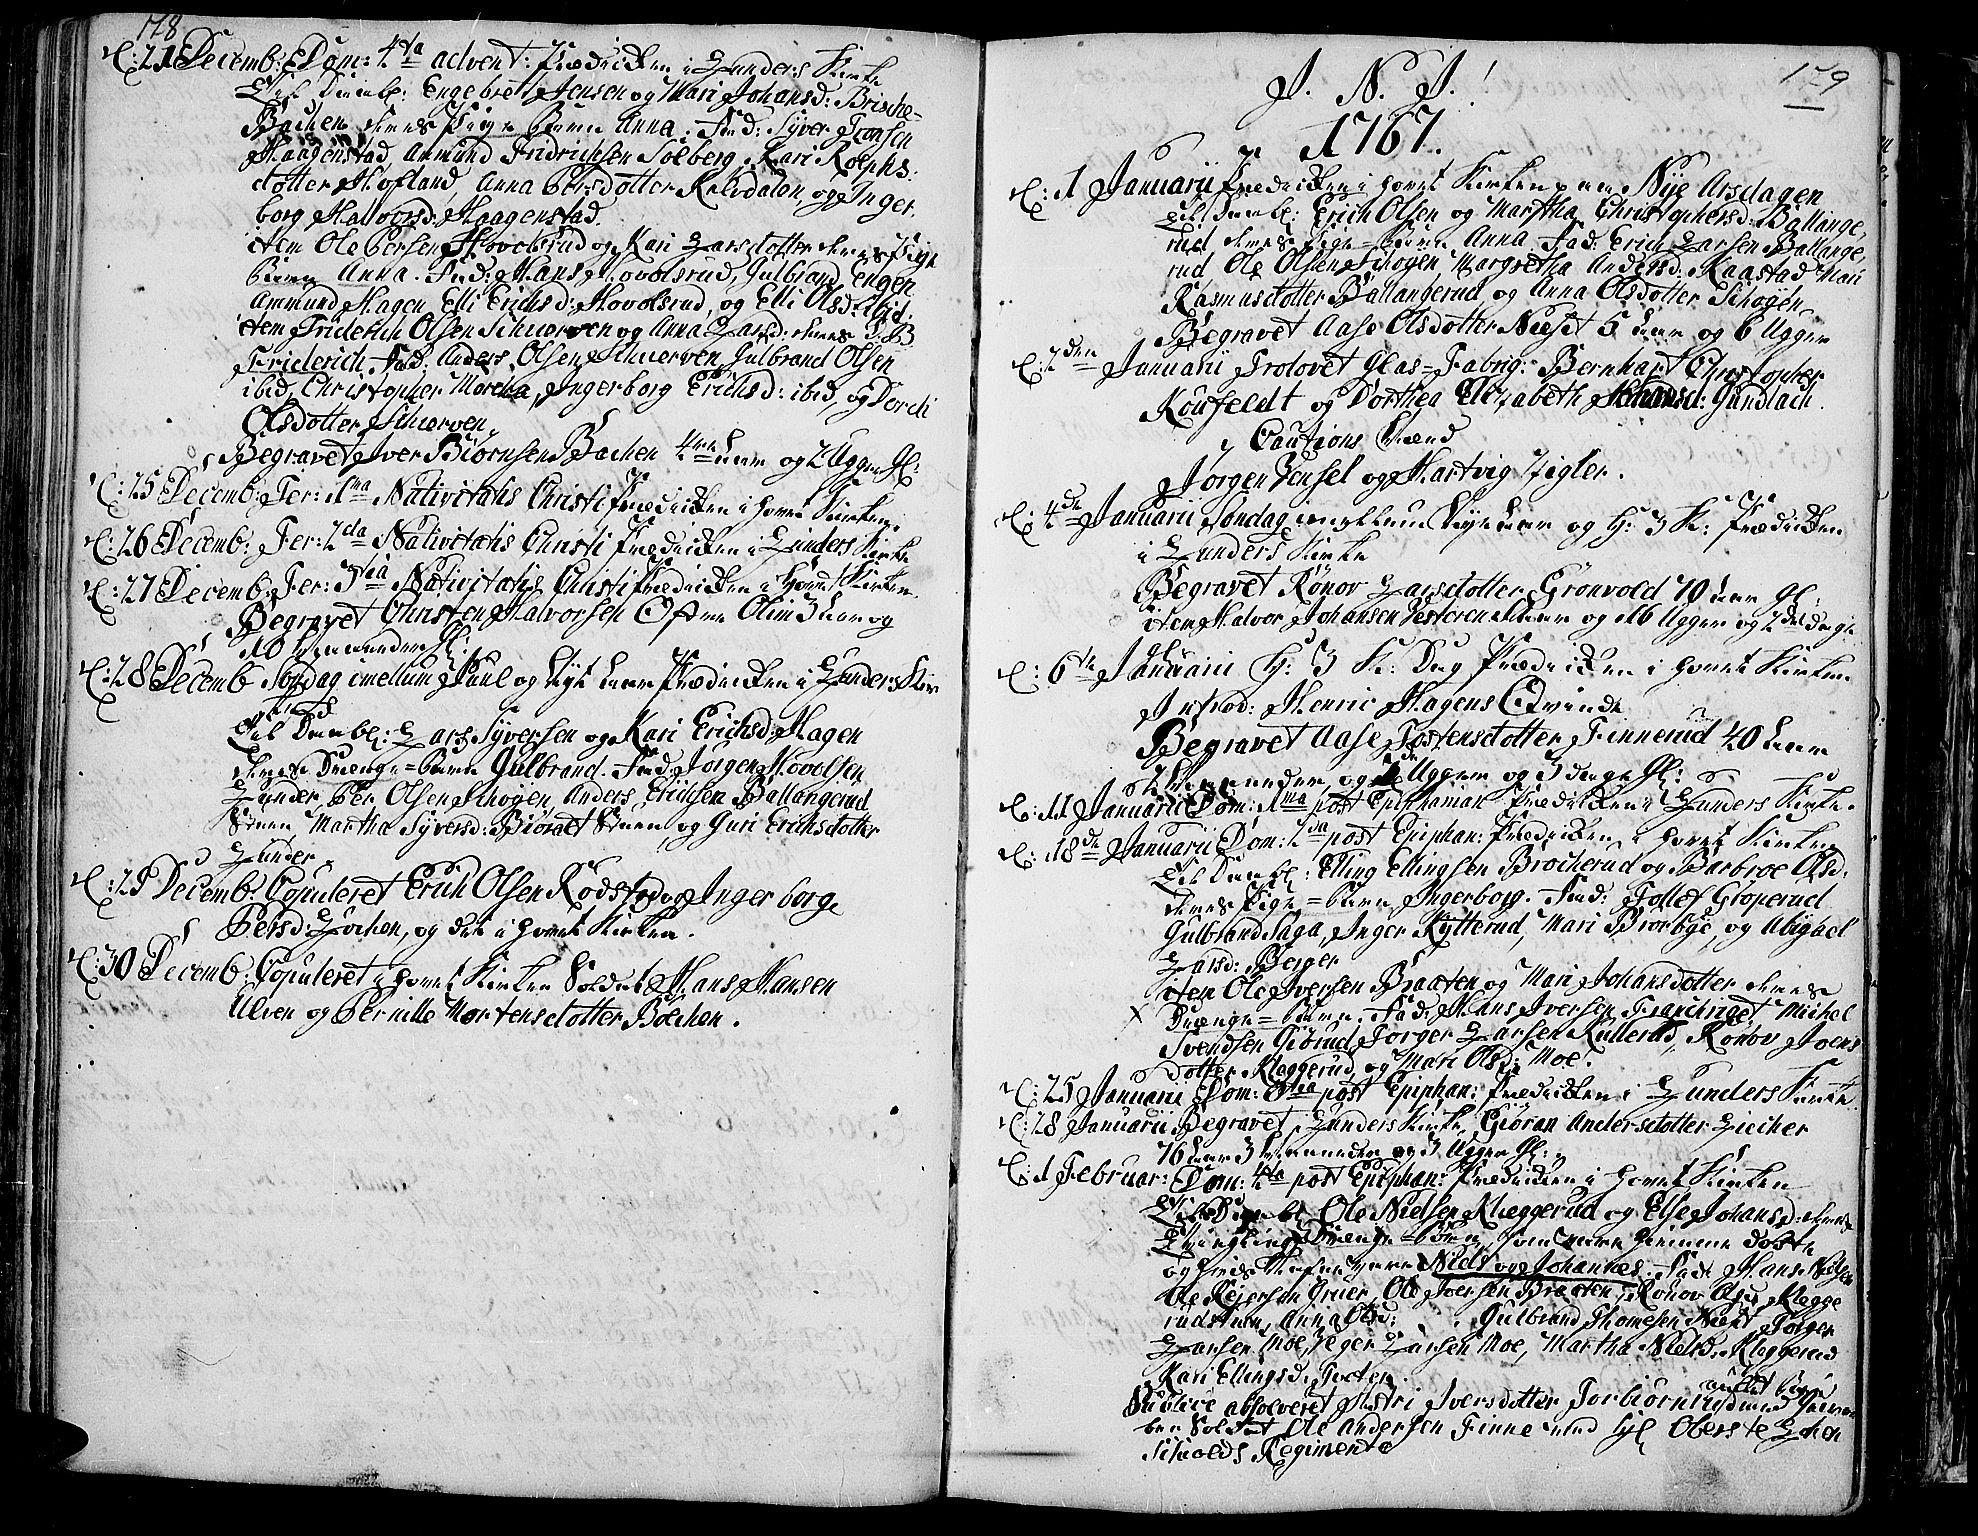 SAH, Jevnaker prestekontor, Ministerialbok nr. 3, 1752-1799, s. 178-179